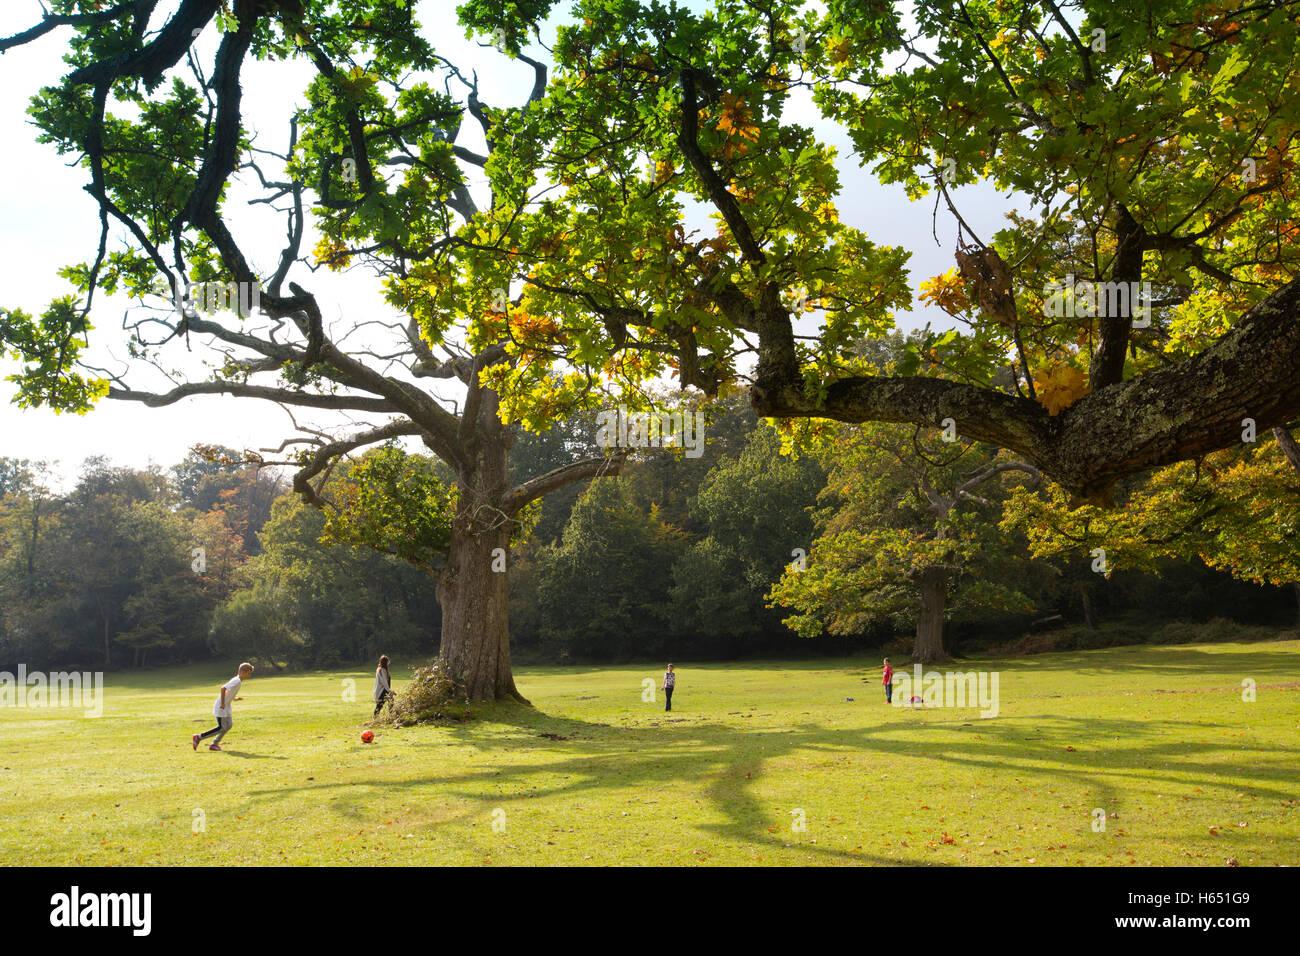 Swan Green, Emery Down, Lyndhurst, Hampshire, England, UK - Stock Image